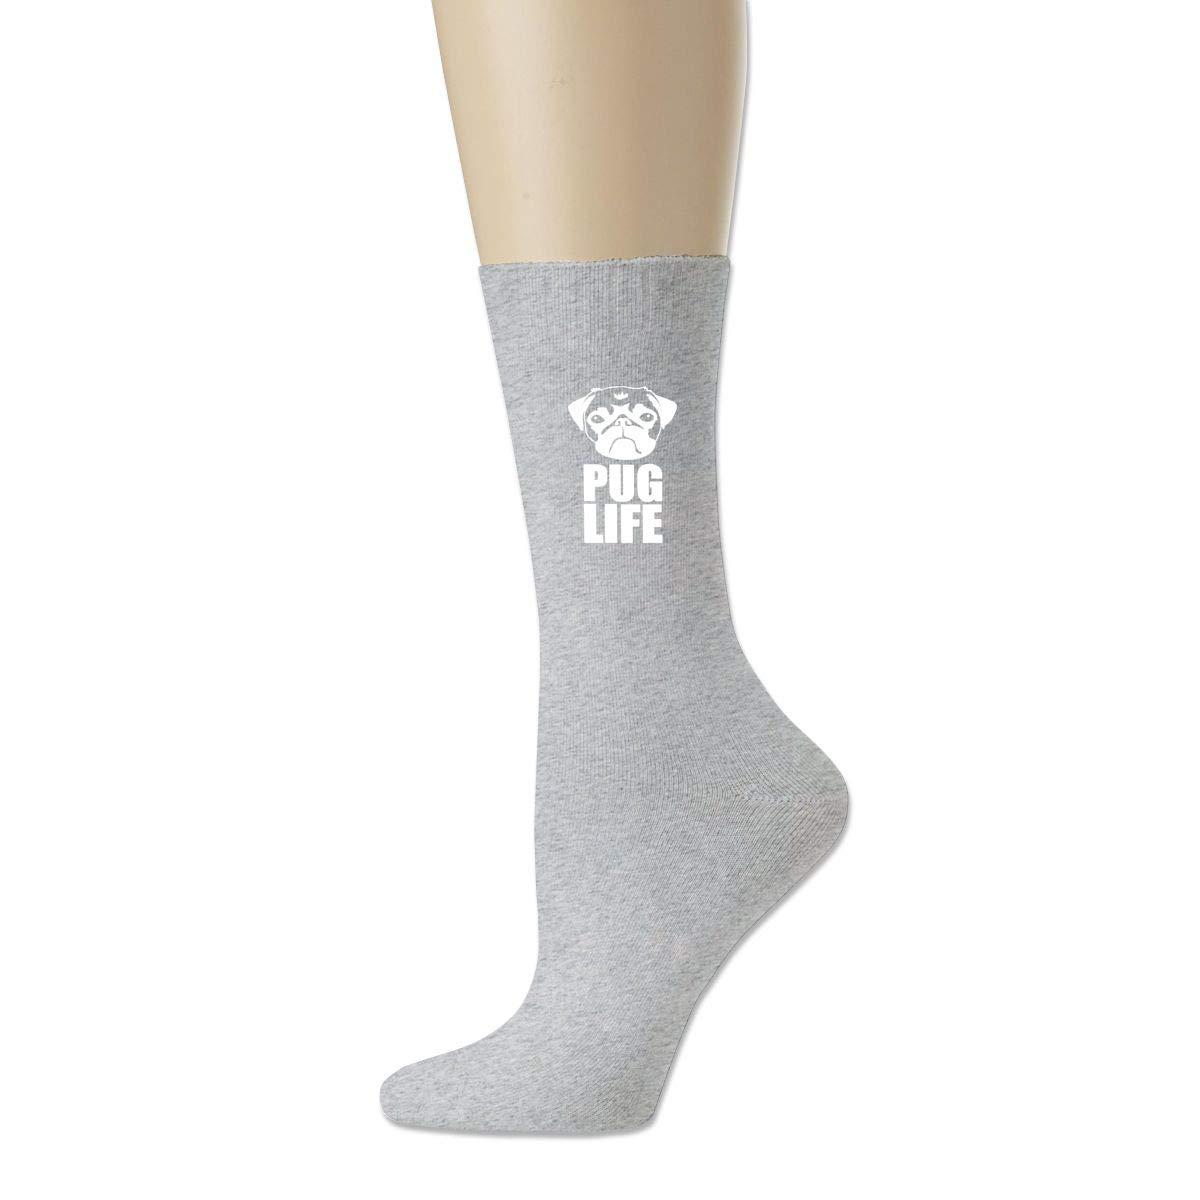 Cotton Crew Bobbysox Ski Socks Unisex Soccer Socks Pug Life Dog